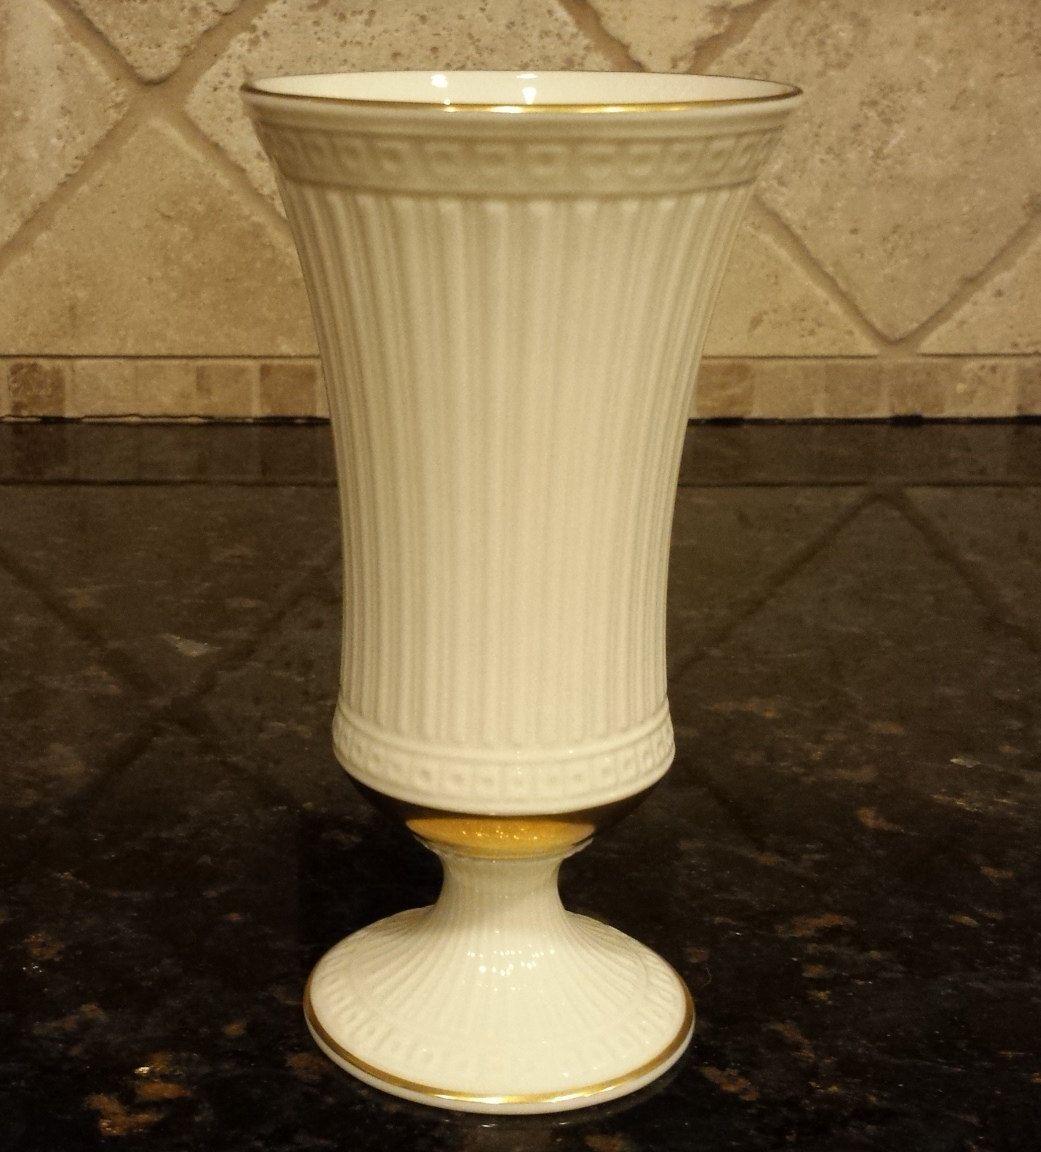 Vintage lenox vase grecian collection ivory porcelain with gold vintage lenox vase grecian collection ivory porcelain with gold trim 7 inch floridaeventfo Choice Image